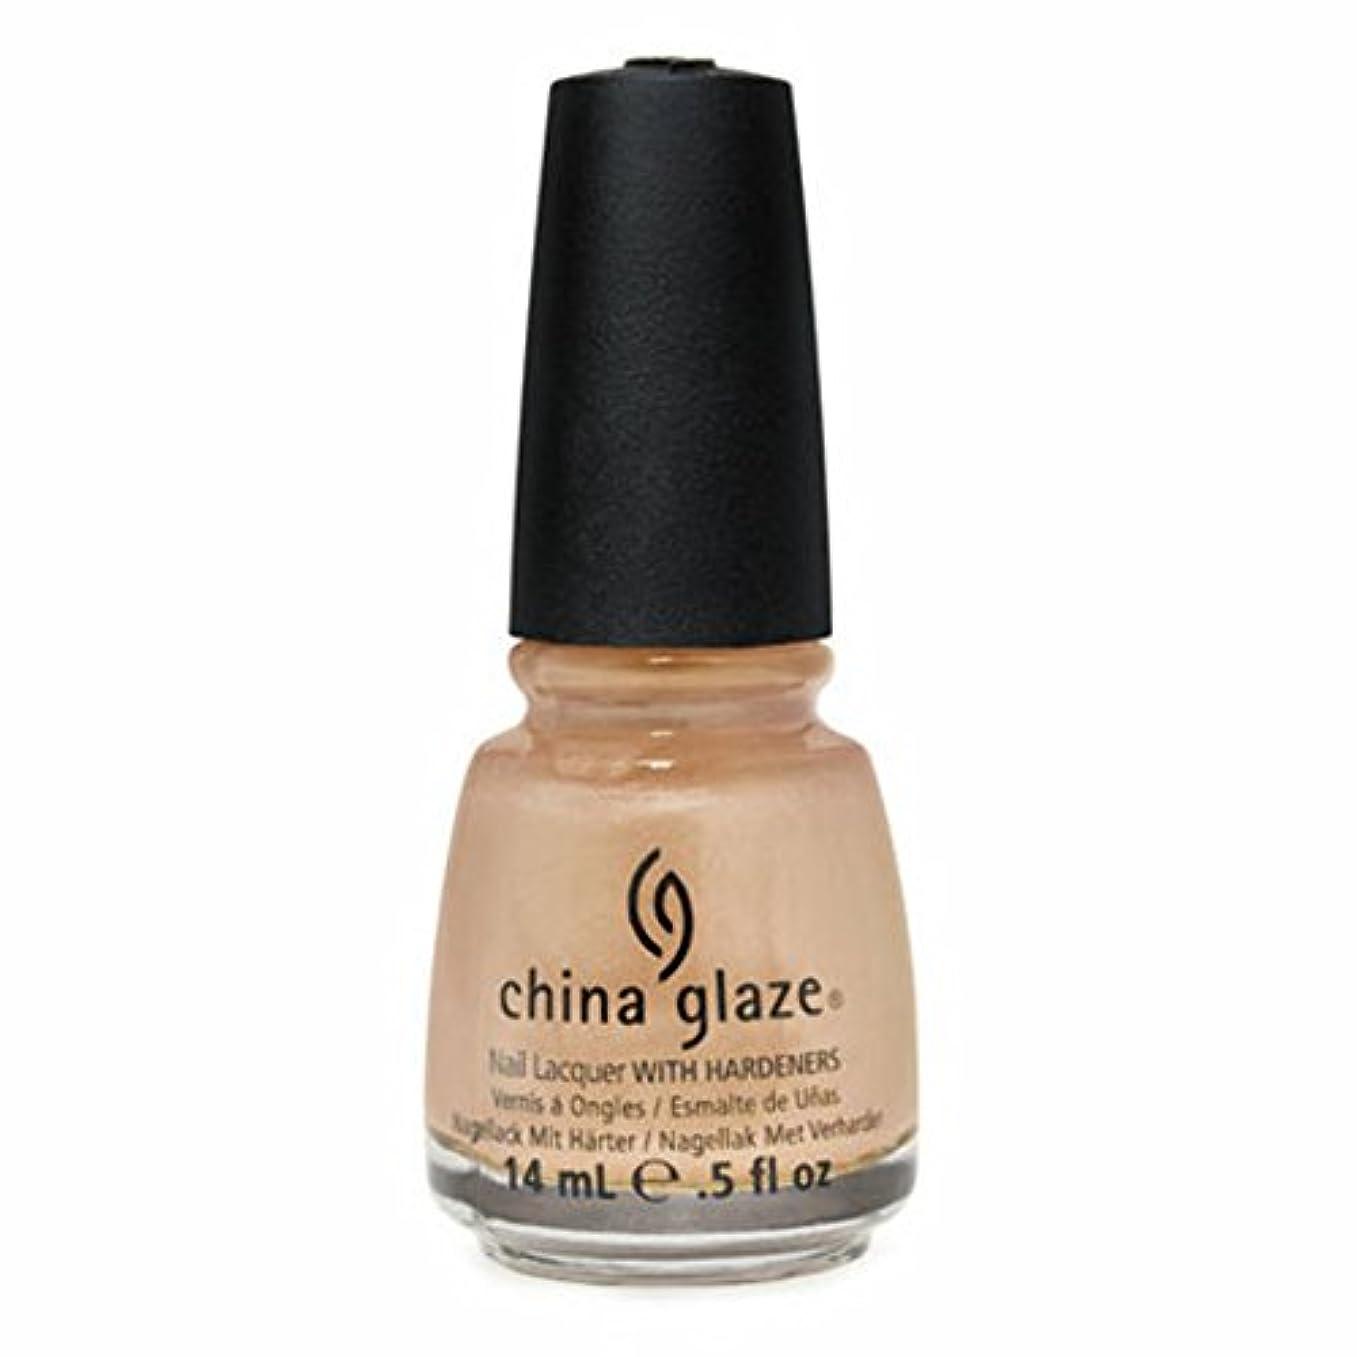 CHINA GLAZE Nail Lacquer - Anchors Away - Knotty (DC) (並行輸入品)